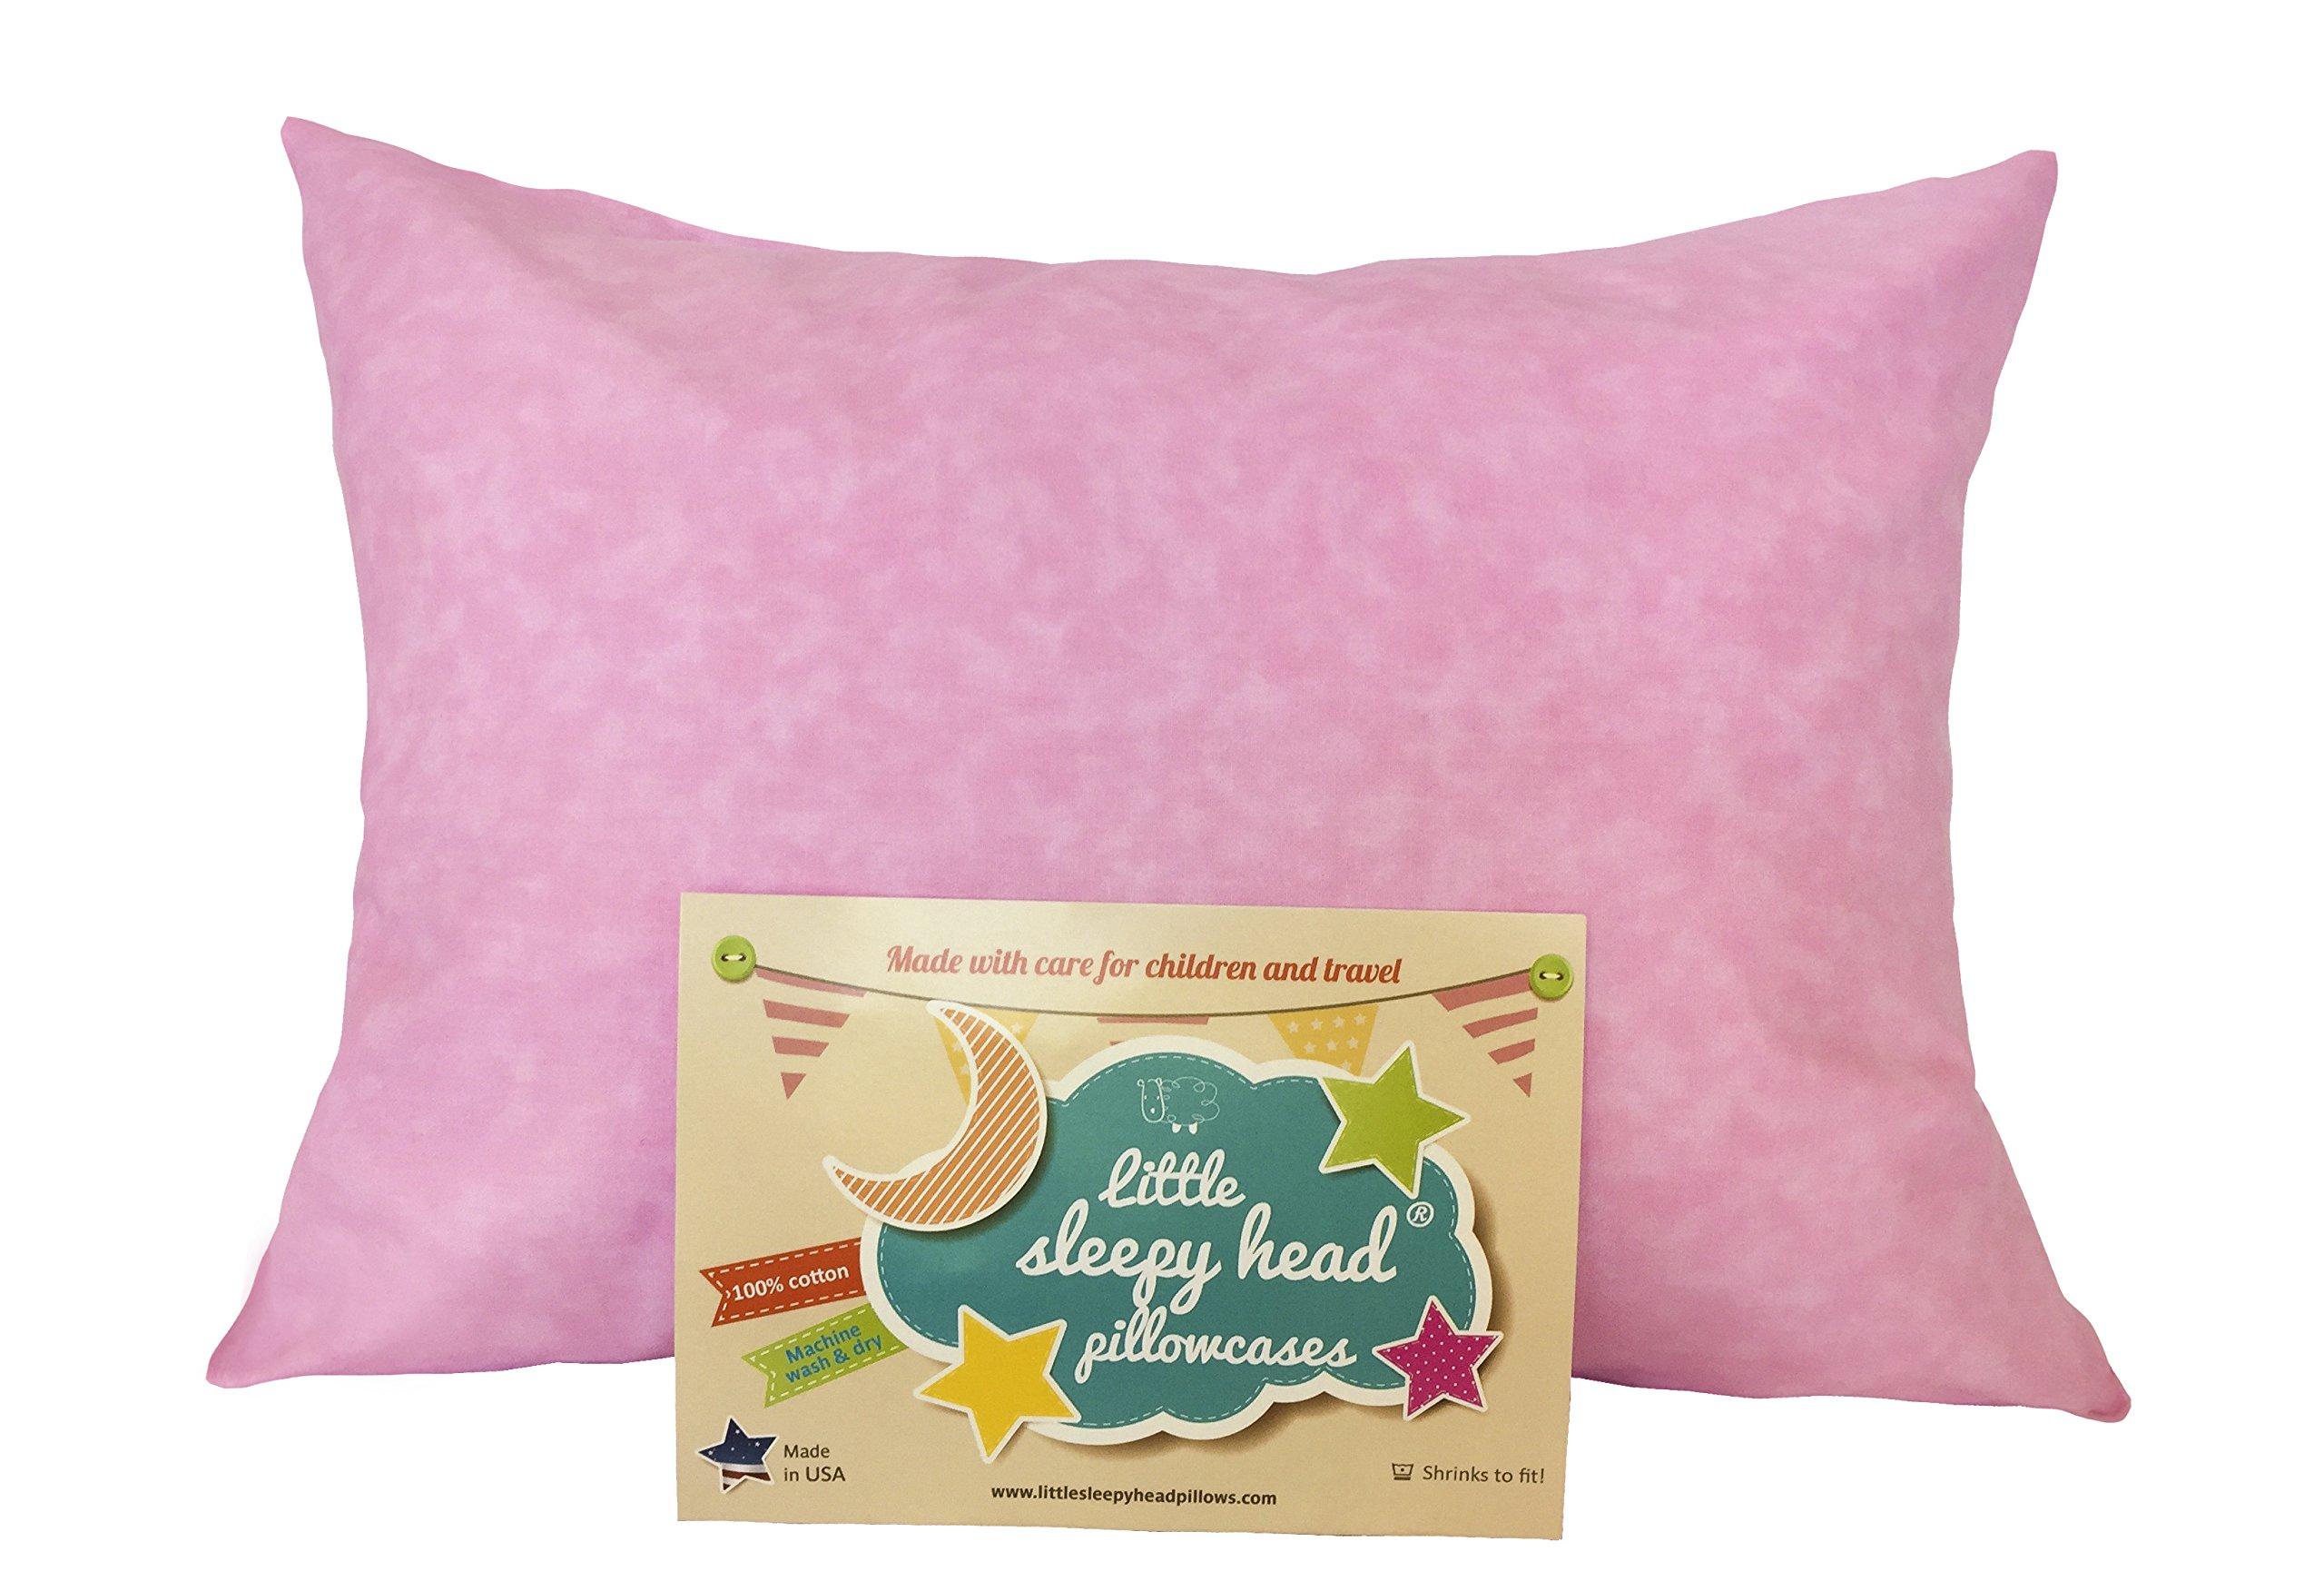 Little Sleepy Head Toddler Pillowcase - Pink Marble, 13 x 18